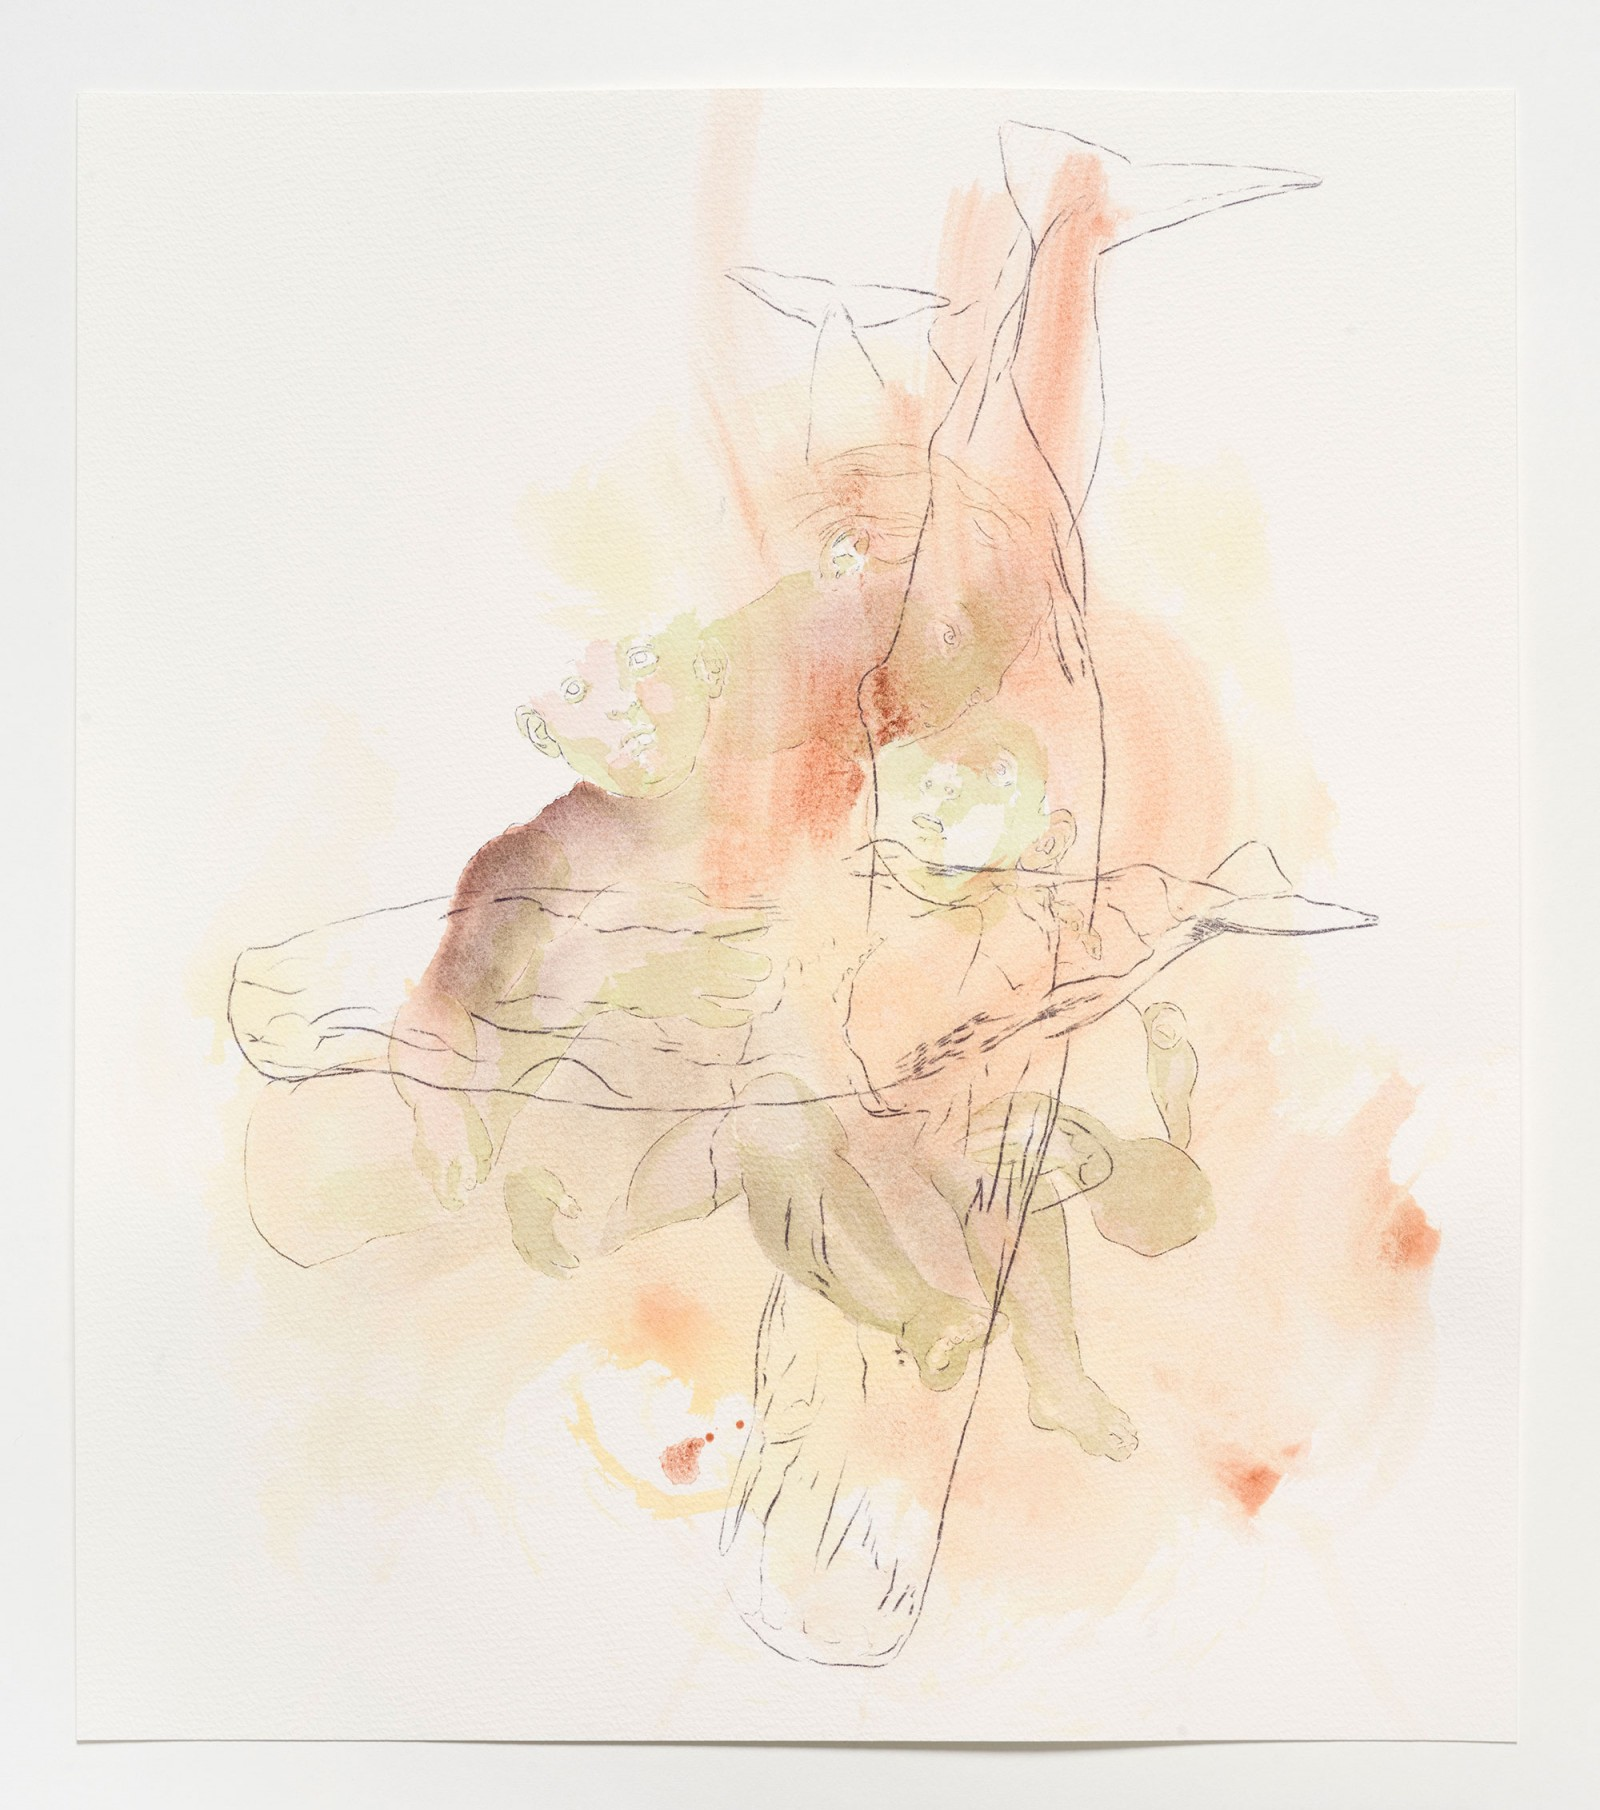 Kim Nekarda: untitled, 2019, carbon & watercolour on paper, 48 x 42 cm